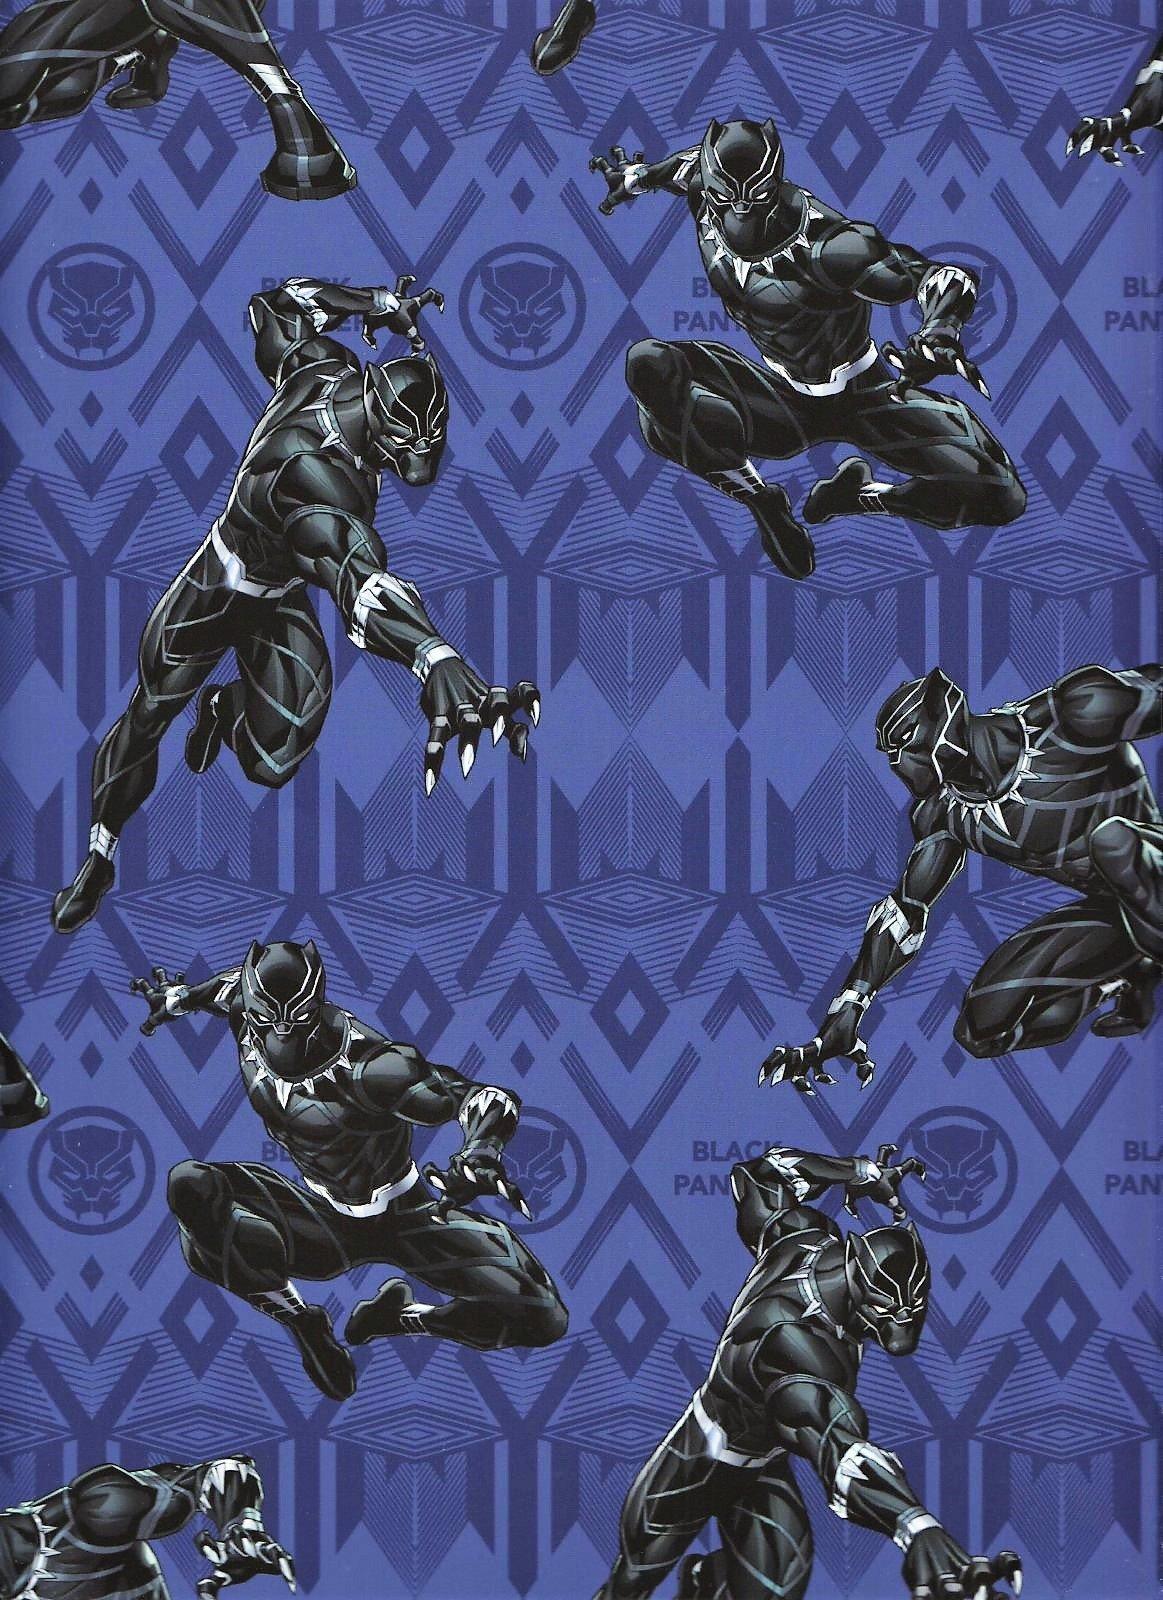 Black Panther 67553 Blue